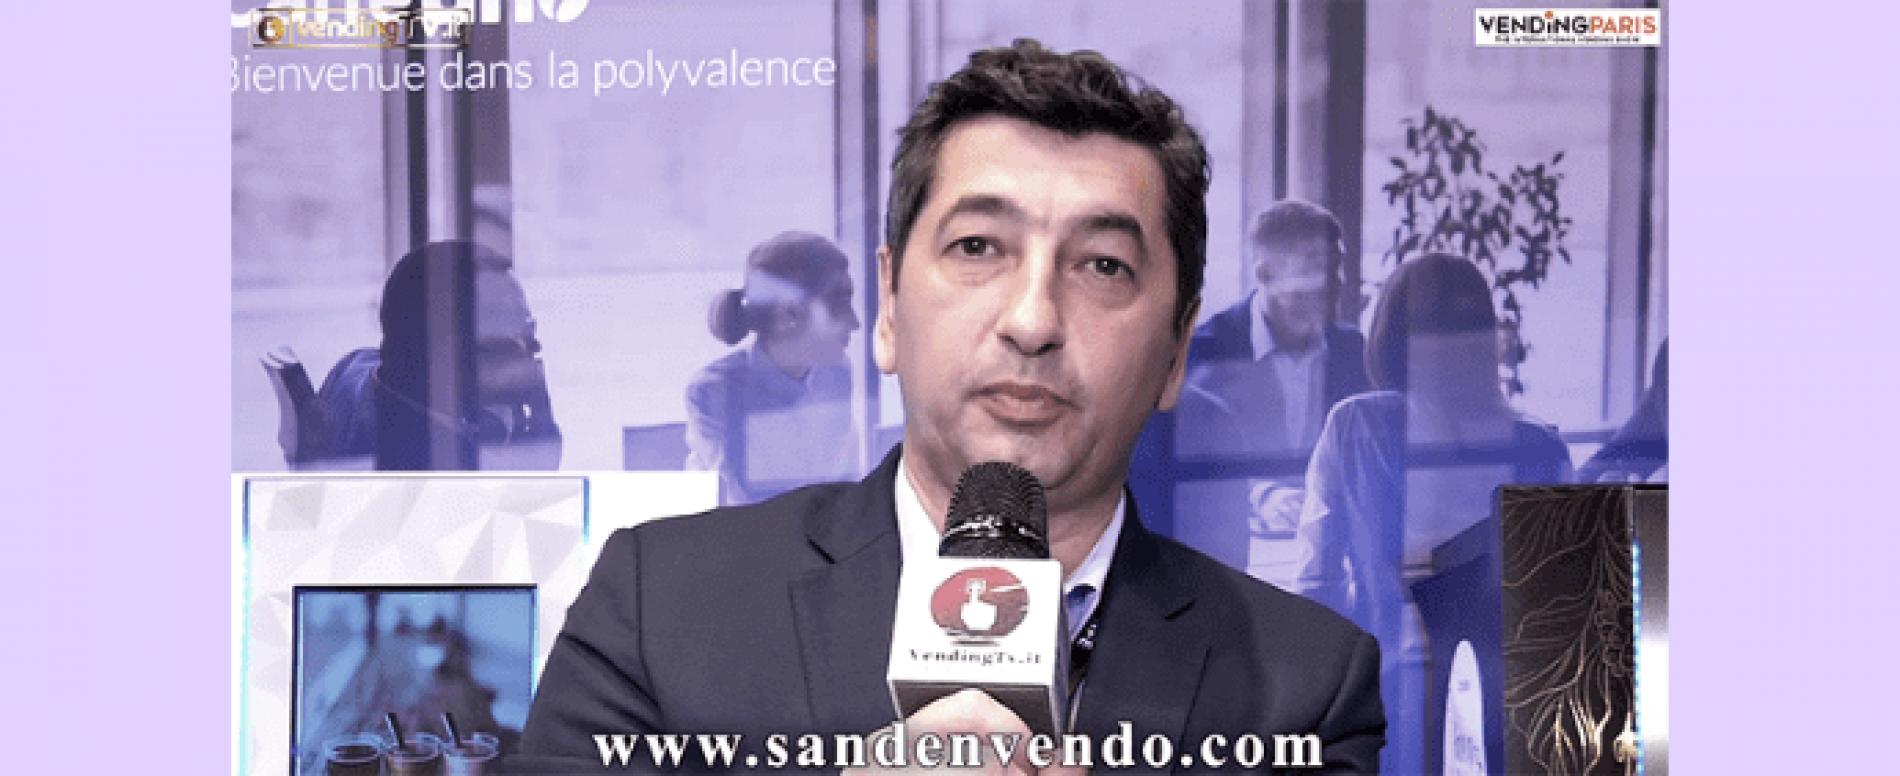 Vending Paris 2019. Intervista allo stand SandenVendo